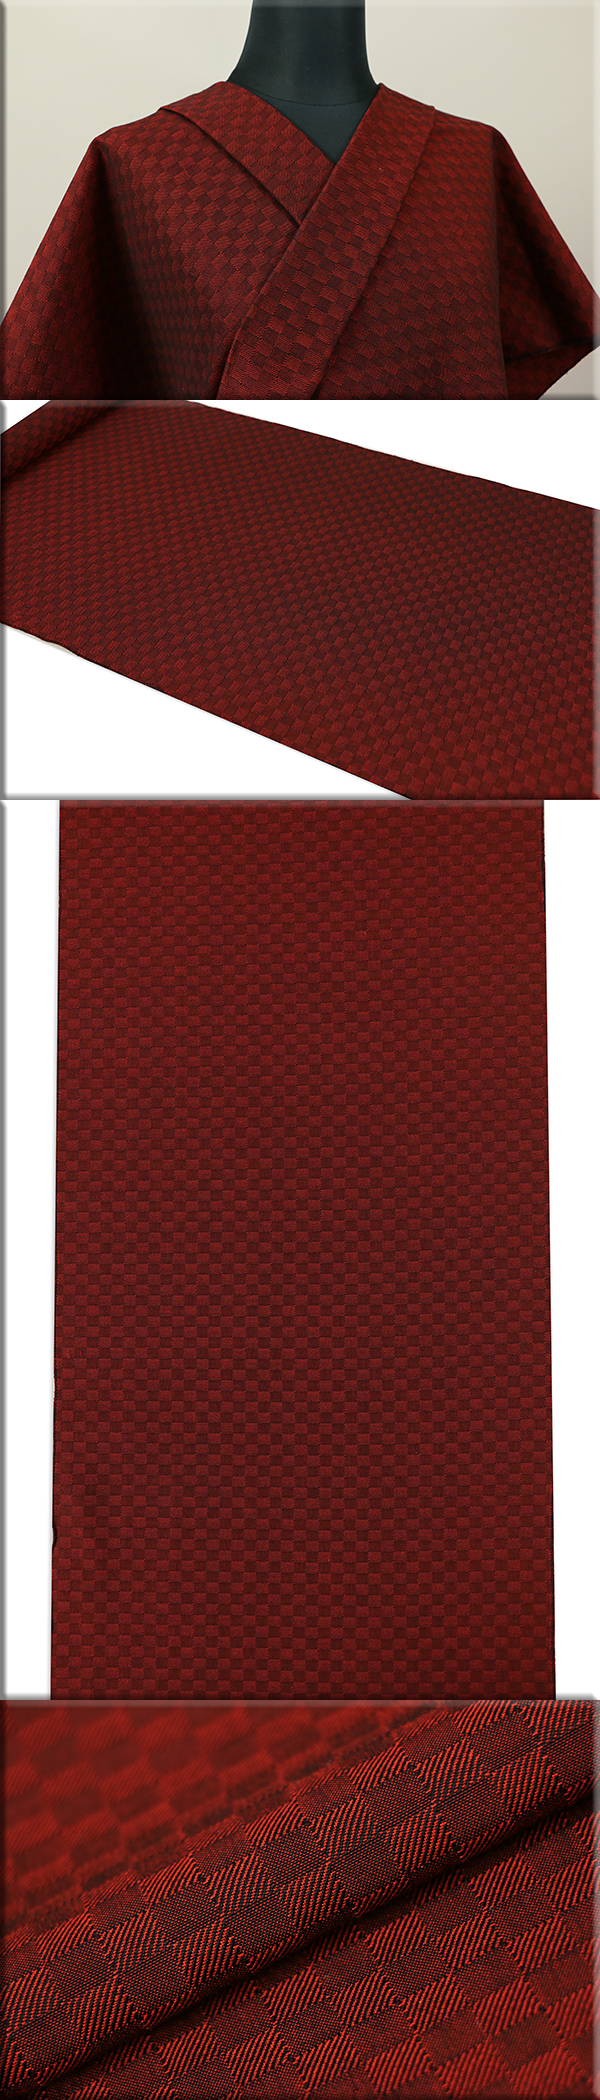 mikawacheck0102